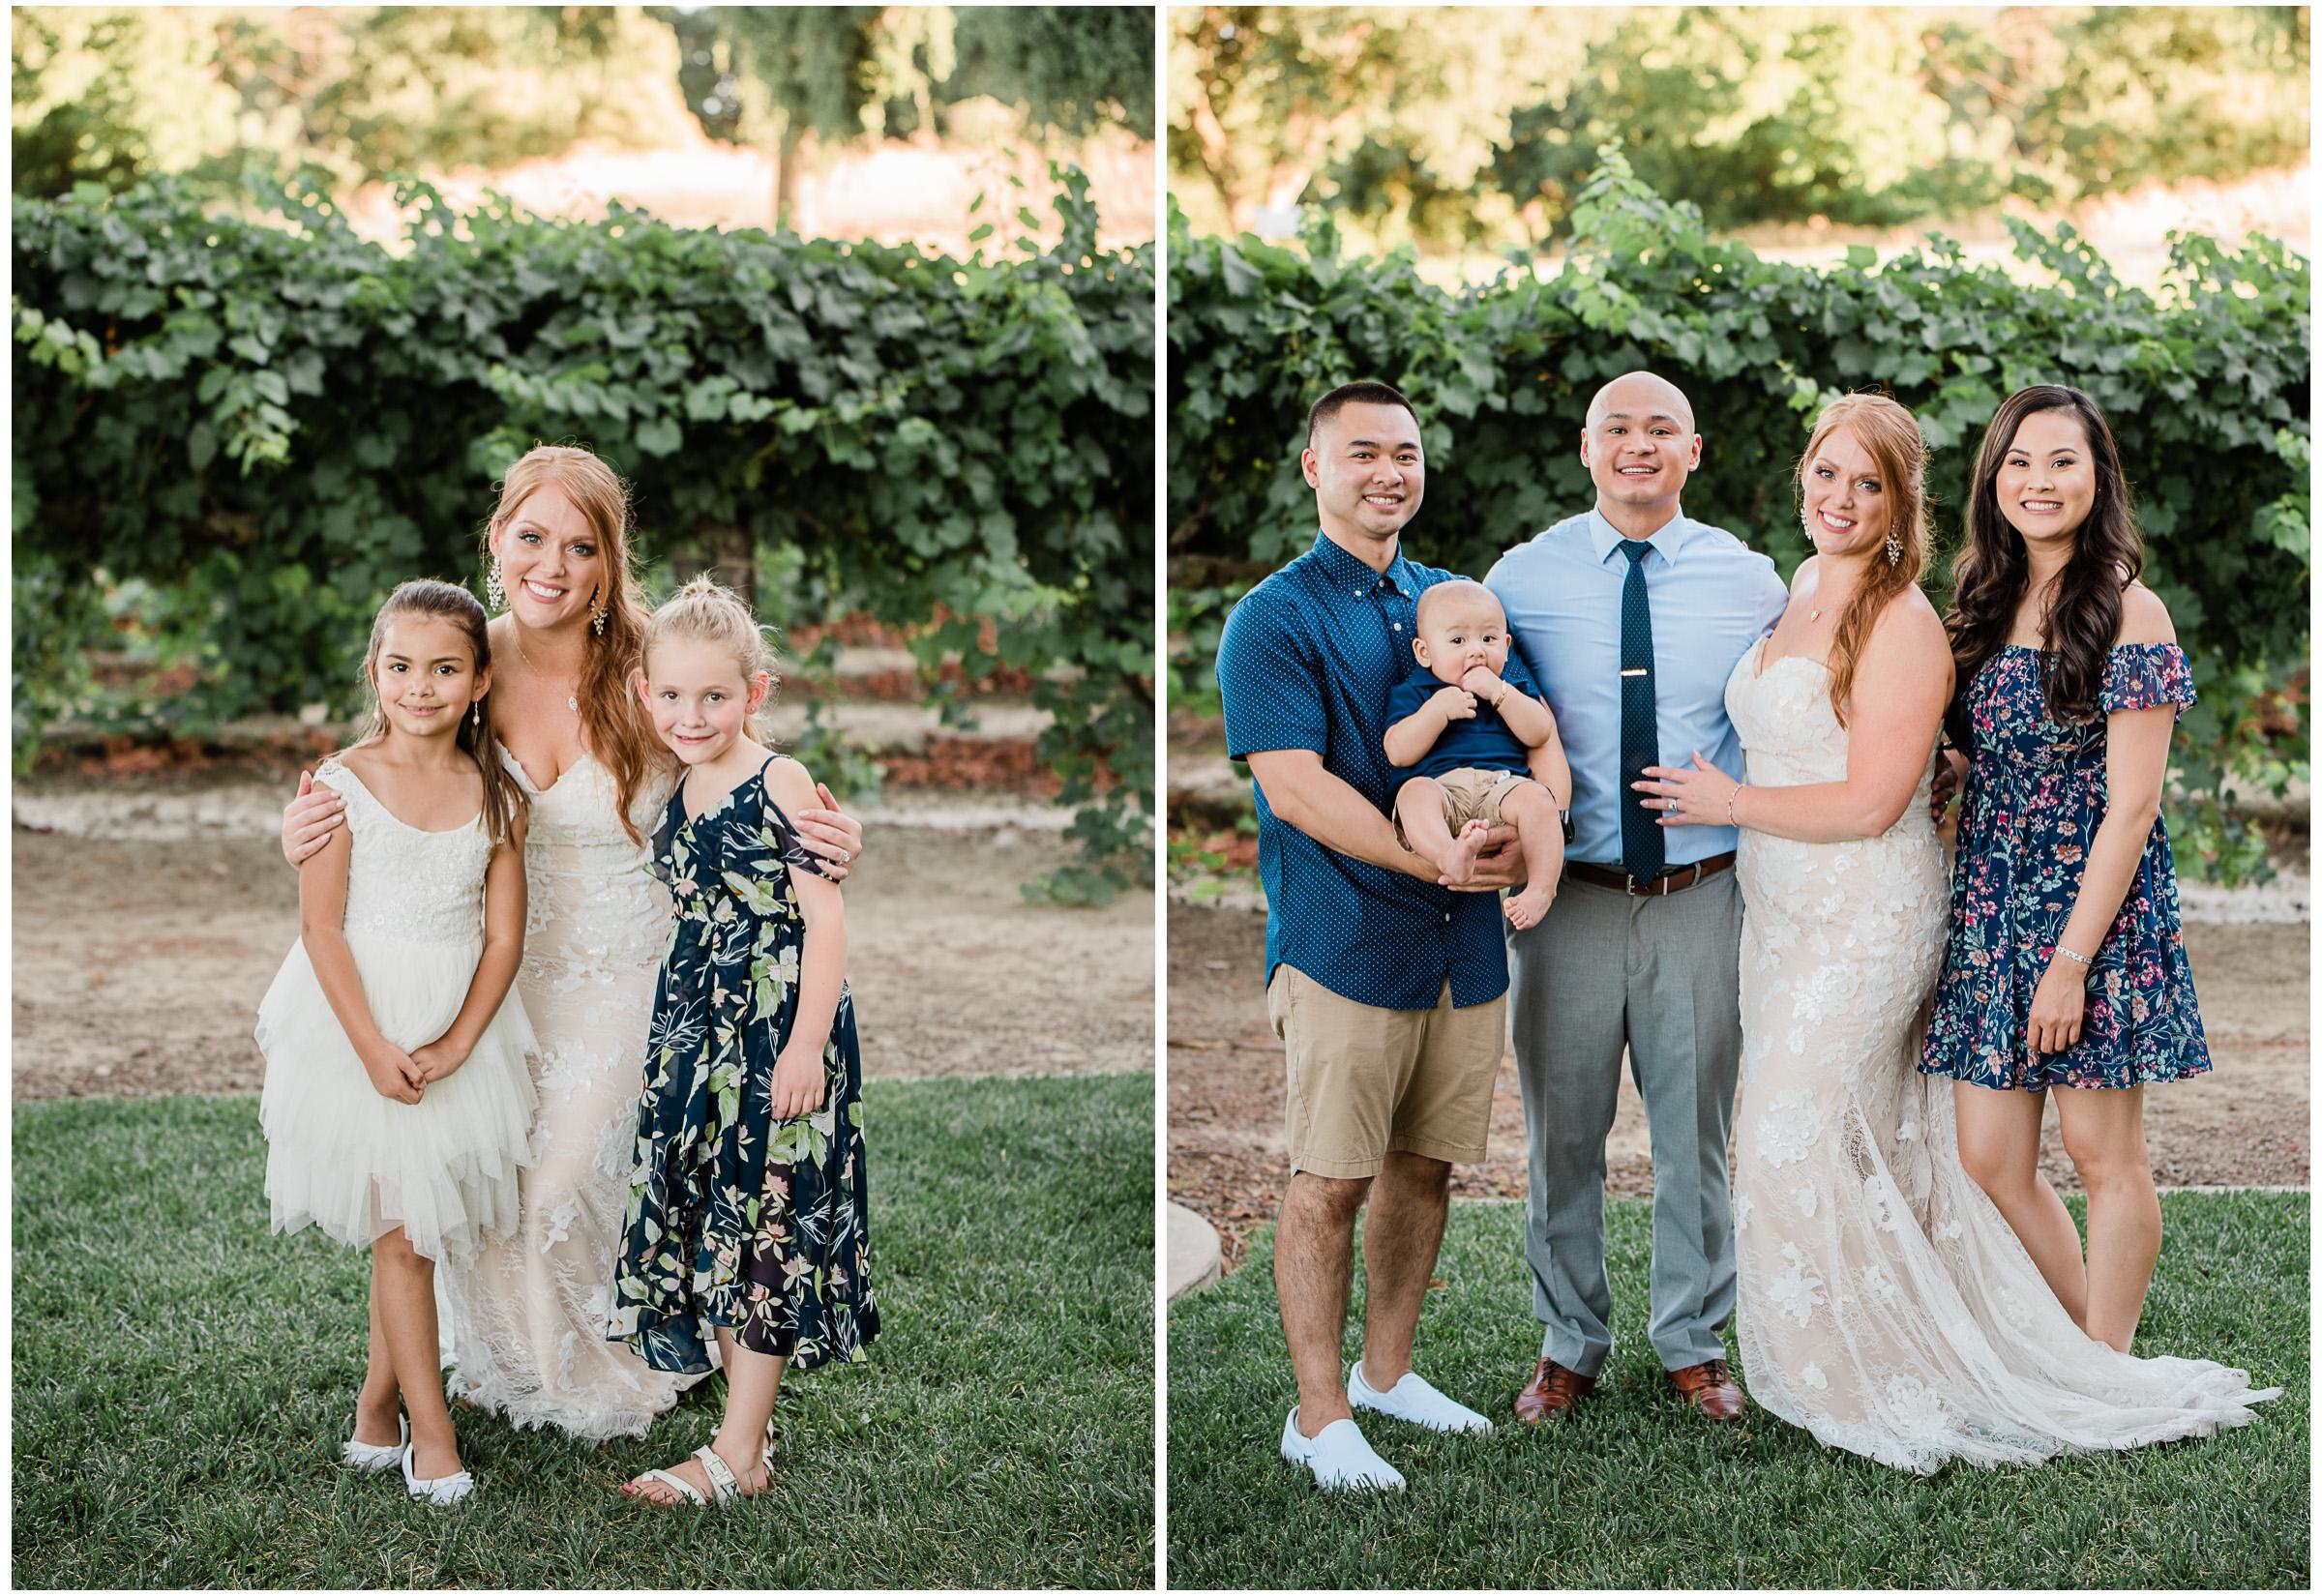 Clarksburg Wedding - Sacramento Photographer - Bogle Winery - Justin Wilcox Photography - 21.jpg